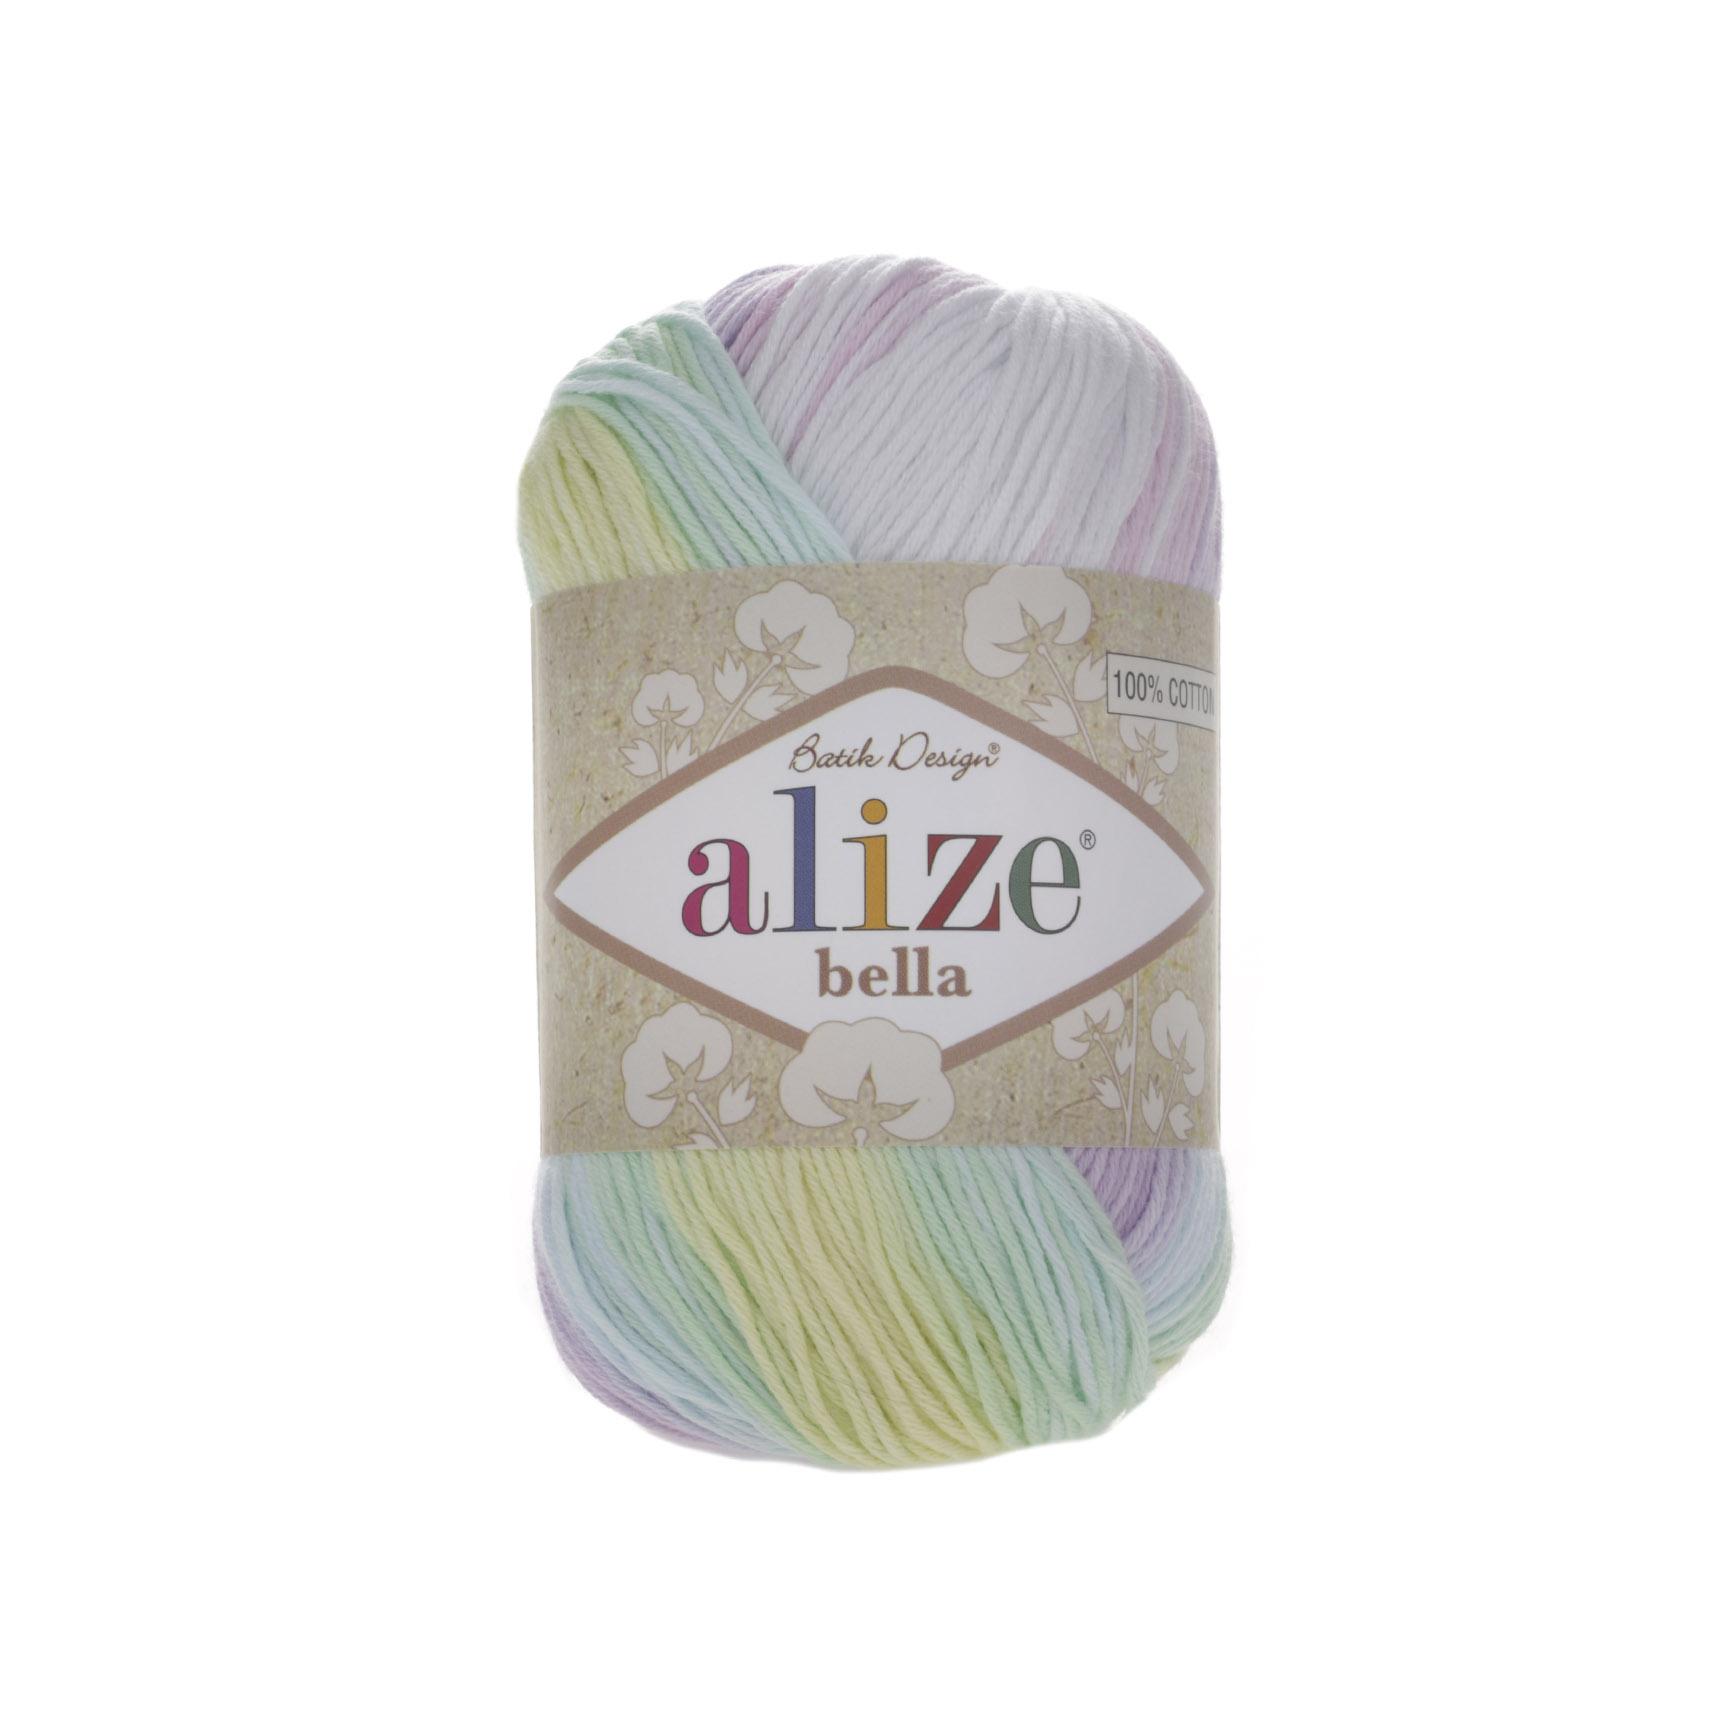 Alize Bella Batik Design Cod 3132-0